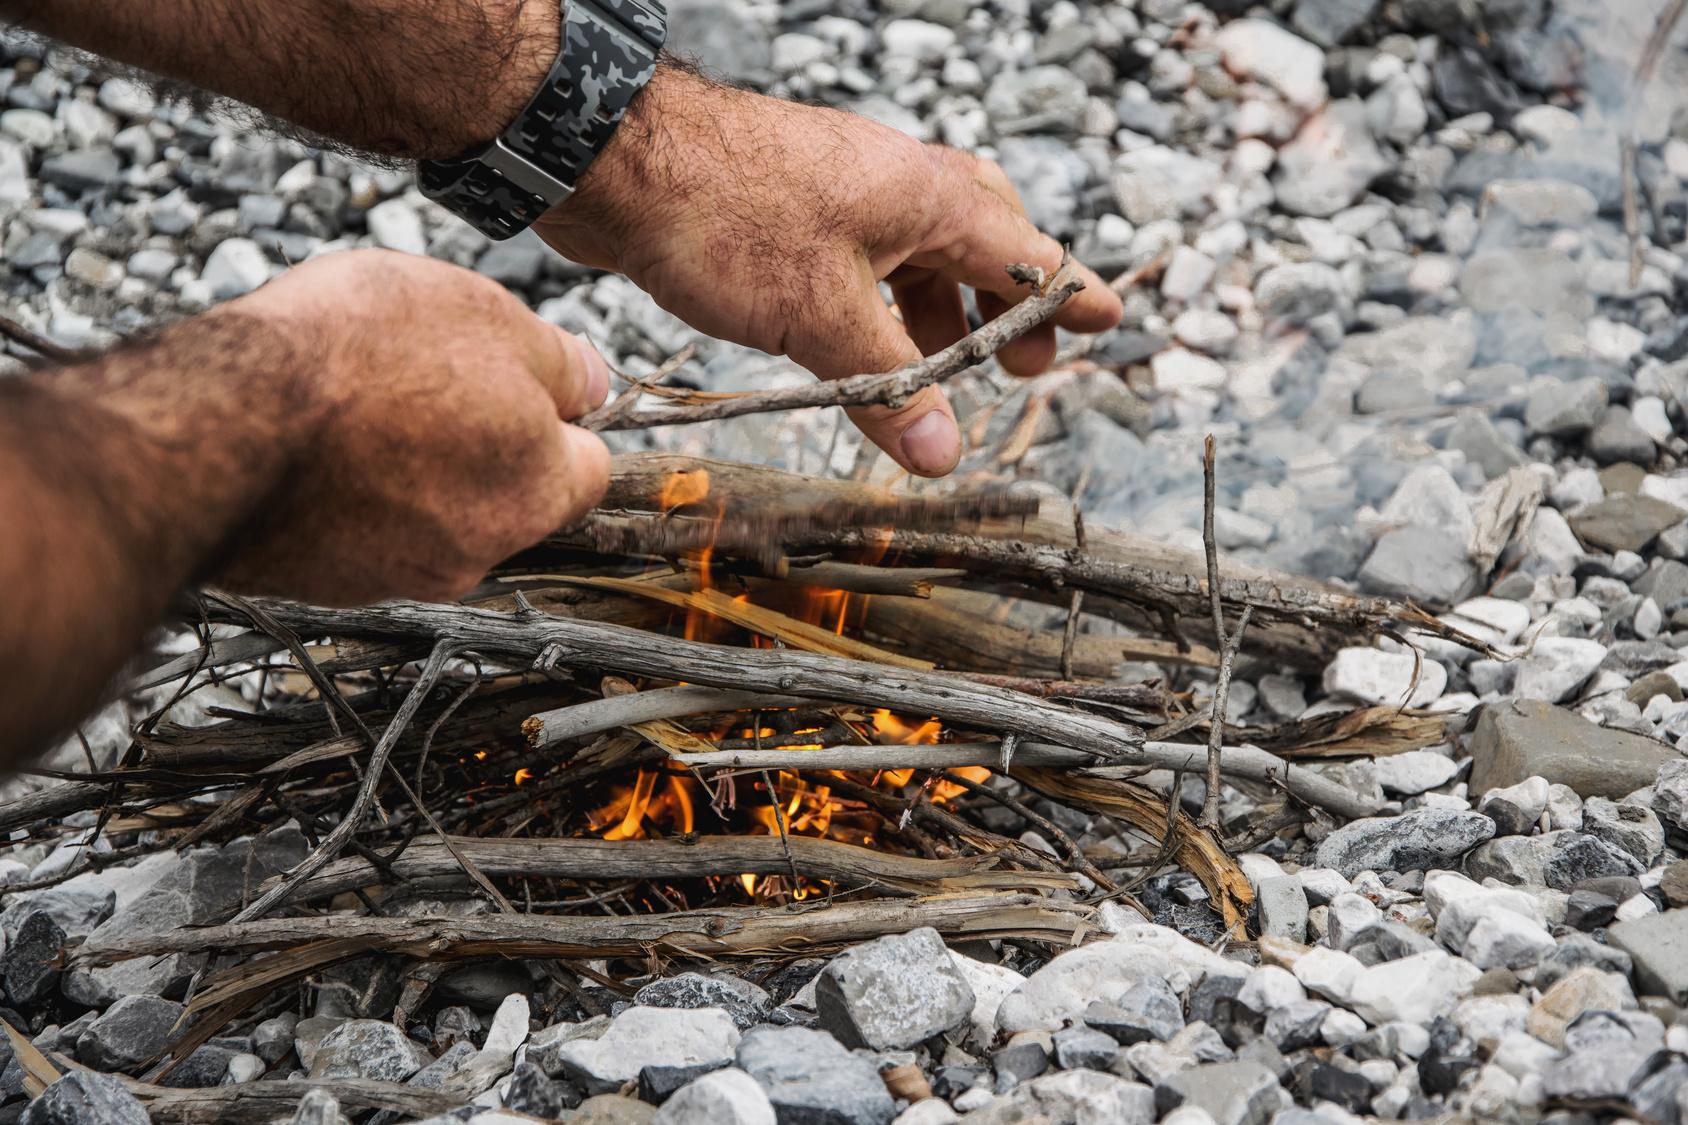 Make the fire